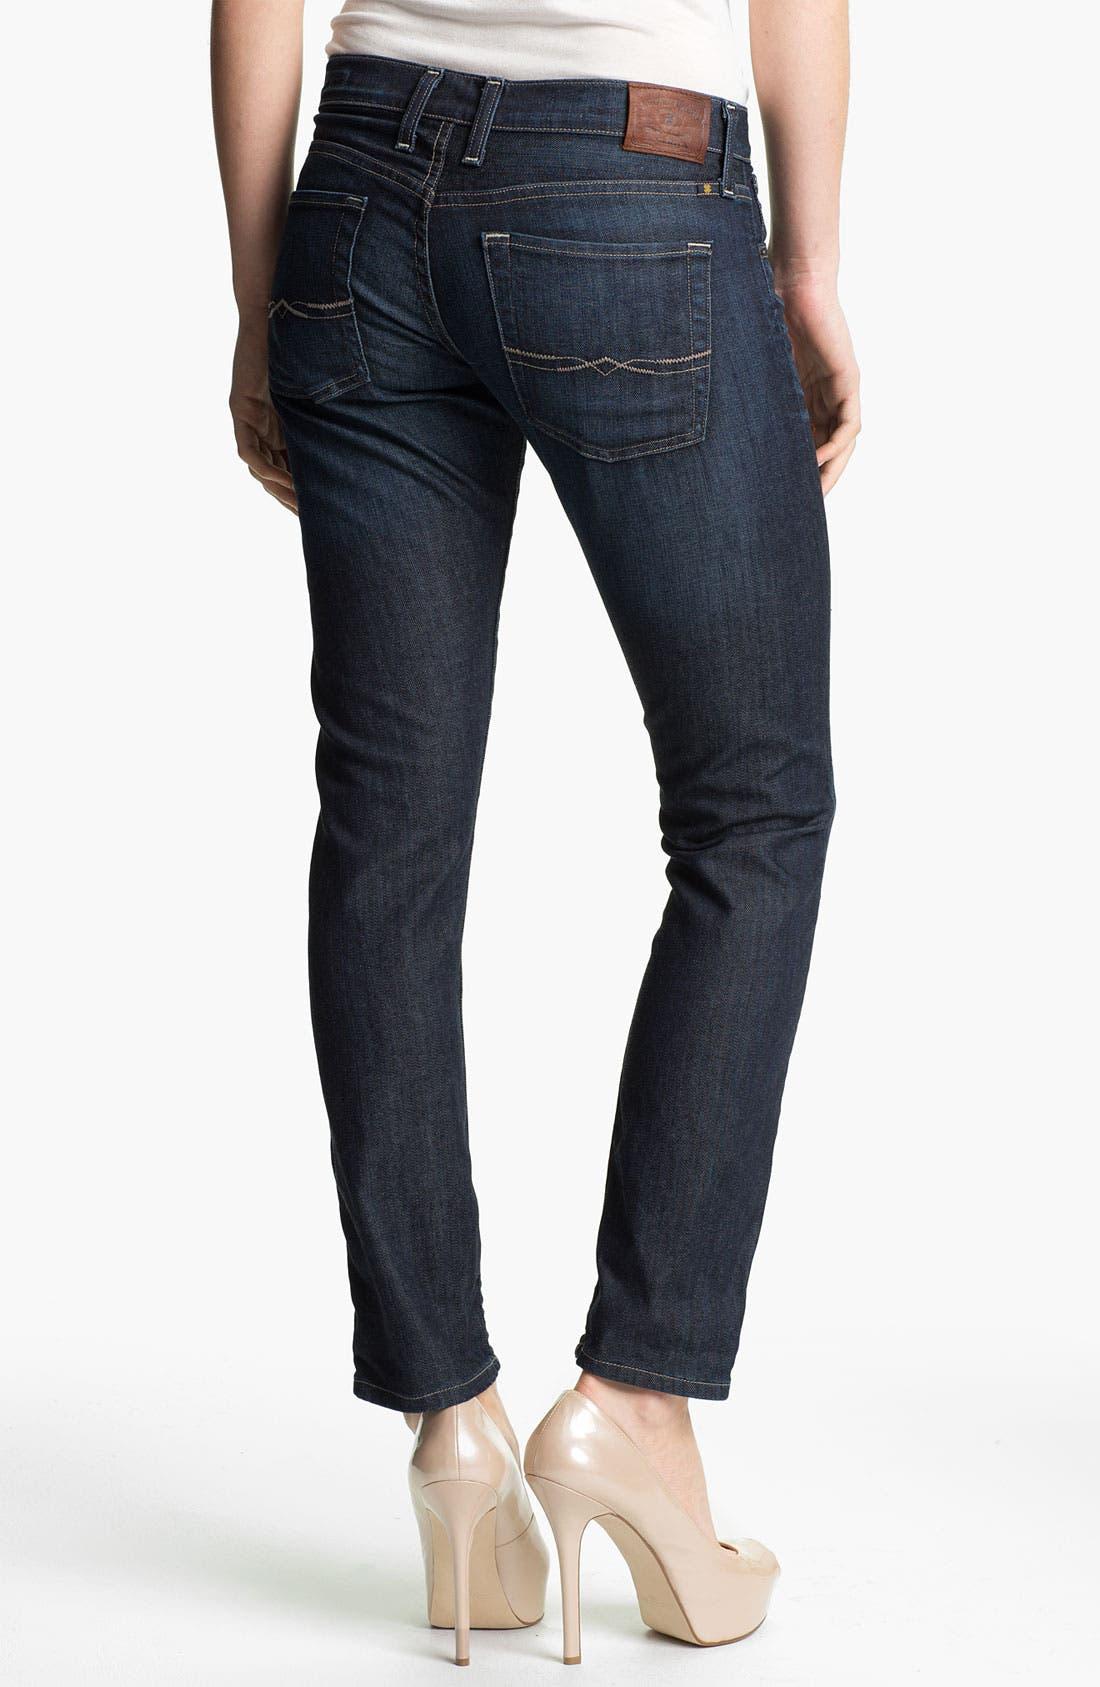 Alternate Image 2  - Lucky Brand 'Sienna' Cigarette Jeans (Dark Paley) (Online Exclusive)